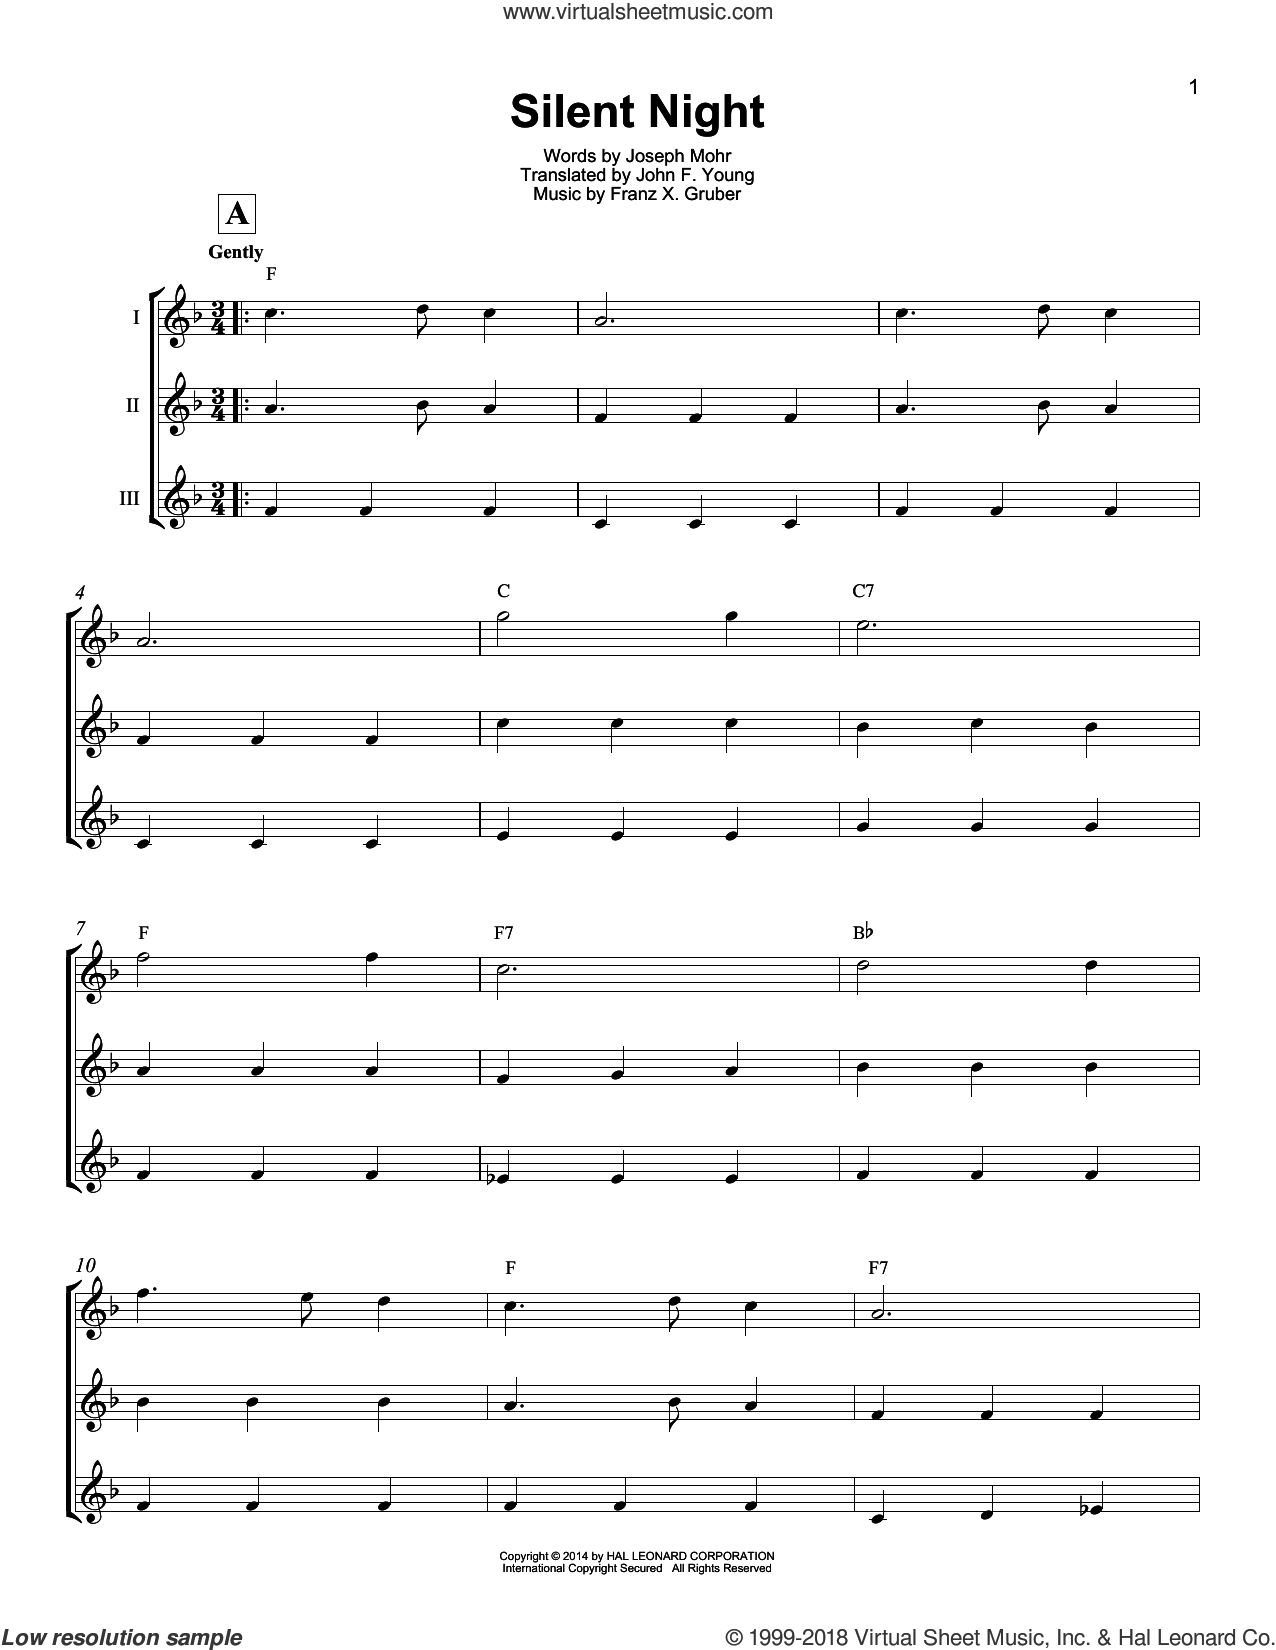 Silent Night sheet music for ukulele ensemble by Franz Gruber, Susan Boyle, John F. Young and Joseph Mohr, intermediate skill level